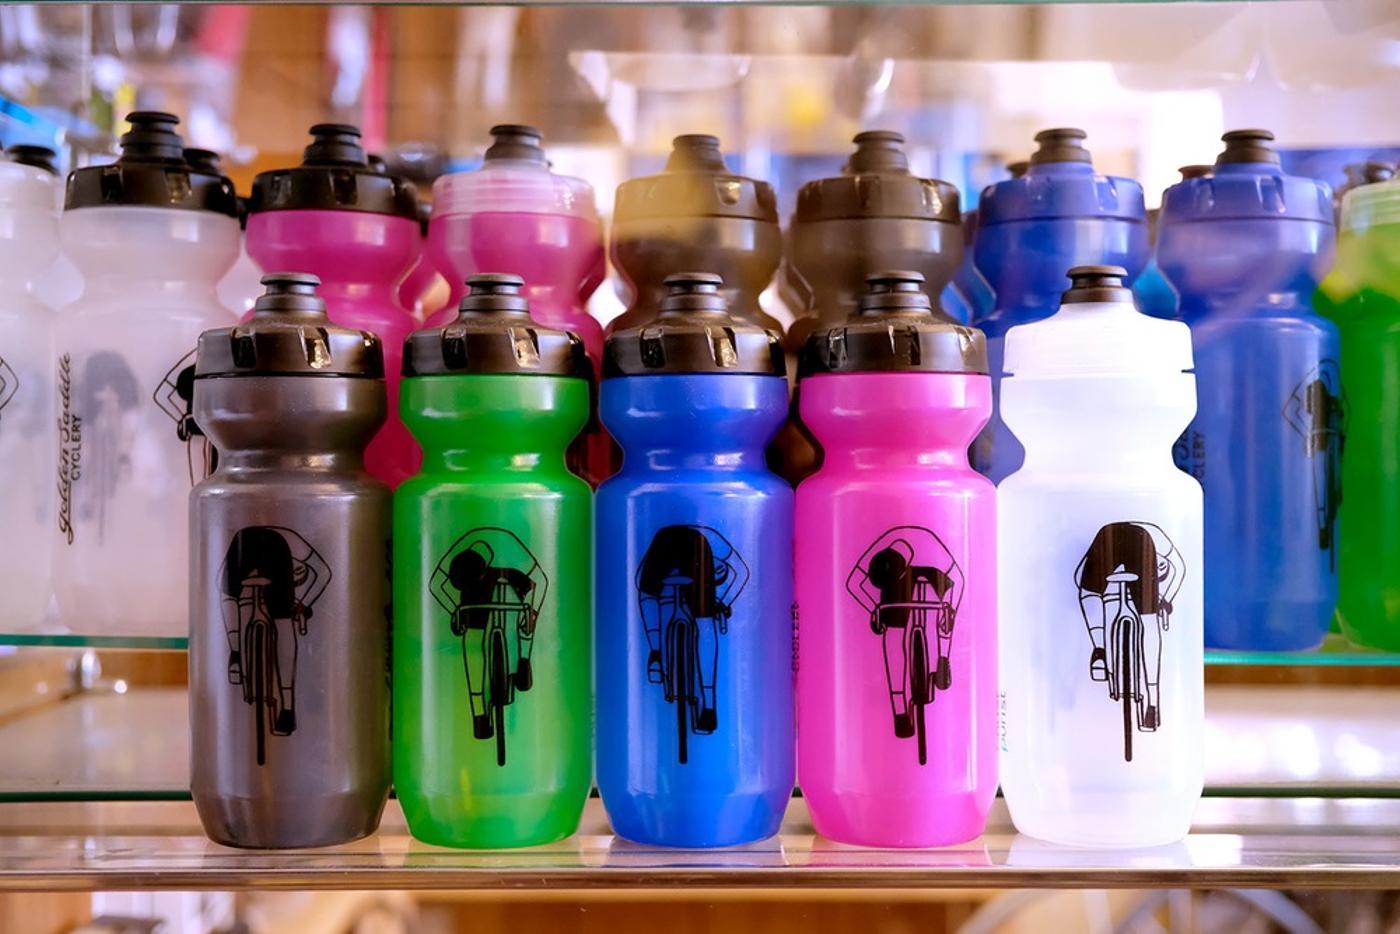 Golden Saddle Cyclery Dropper Bottles by Geoff McFetridge